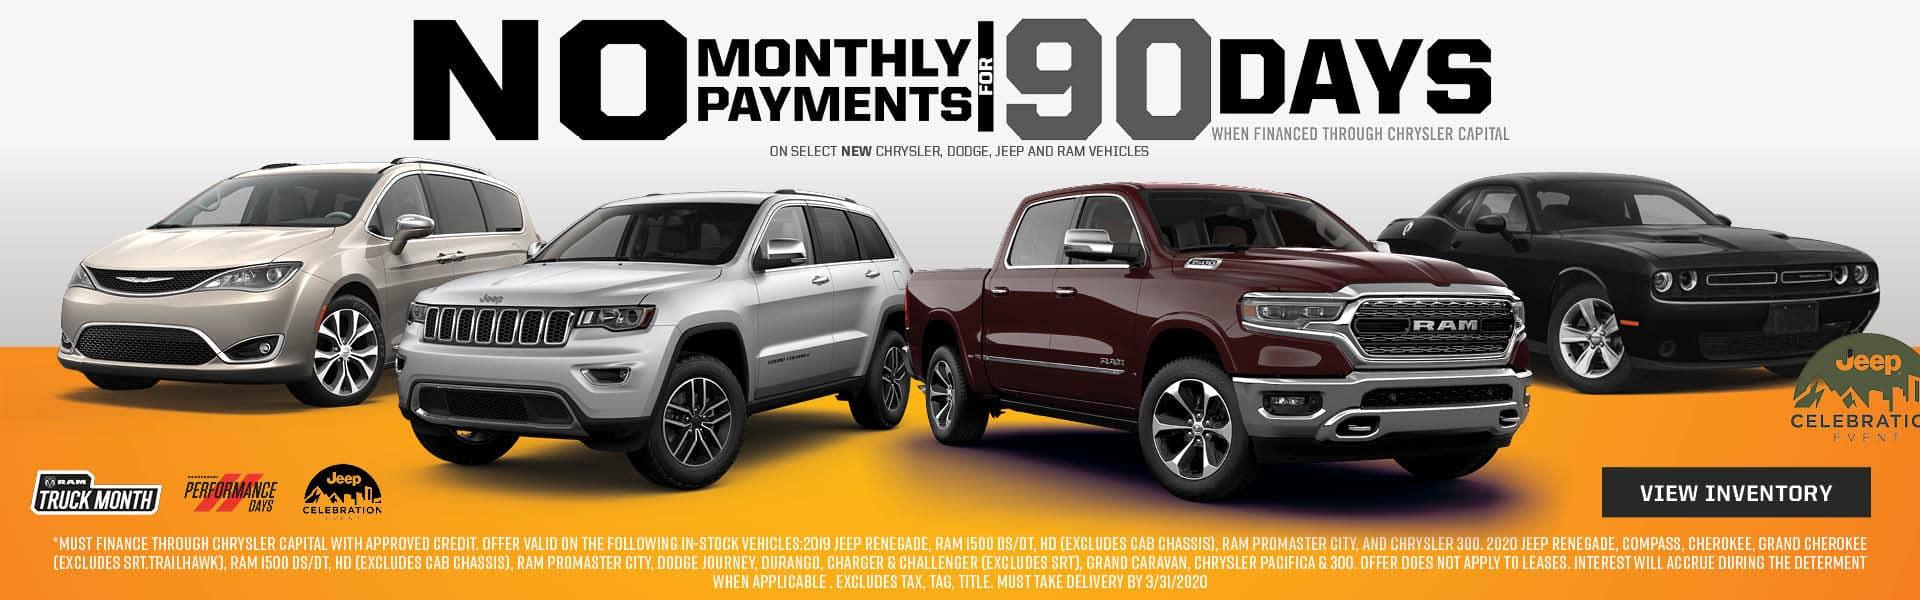 No Payments For 90 Days in Pinckney, MI